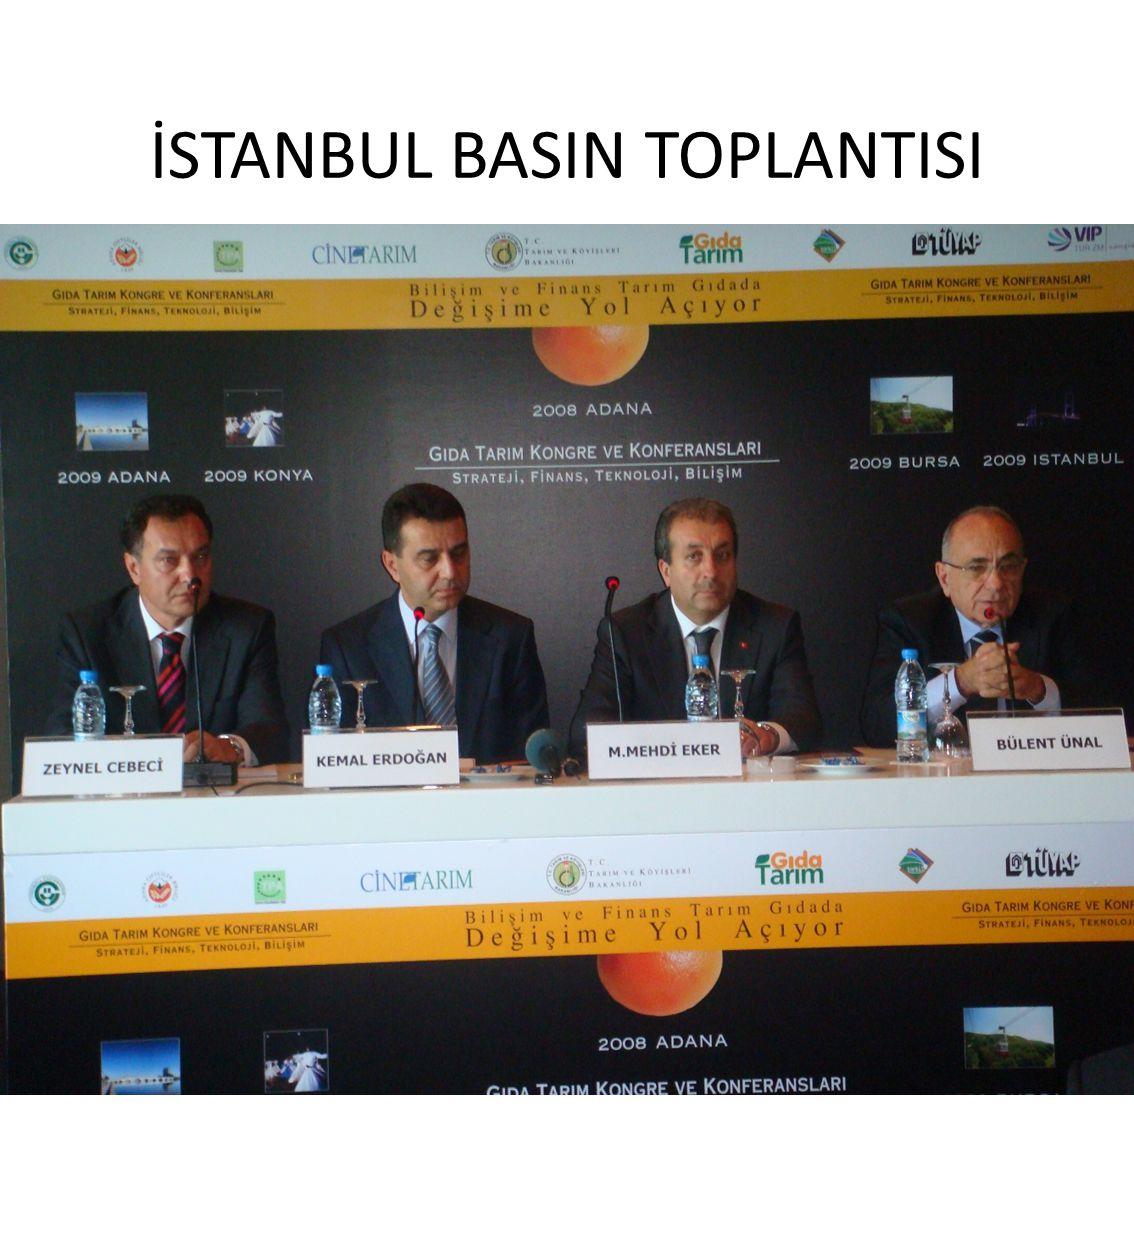 İSTANBUL BASIN TOPLANTISI